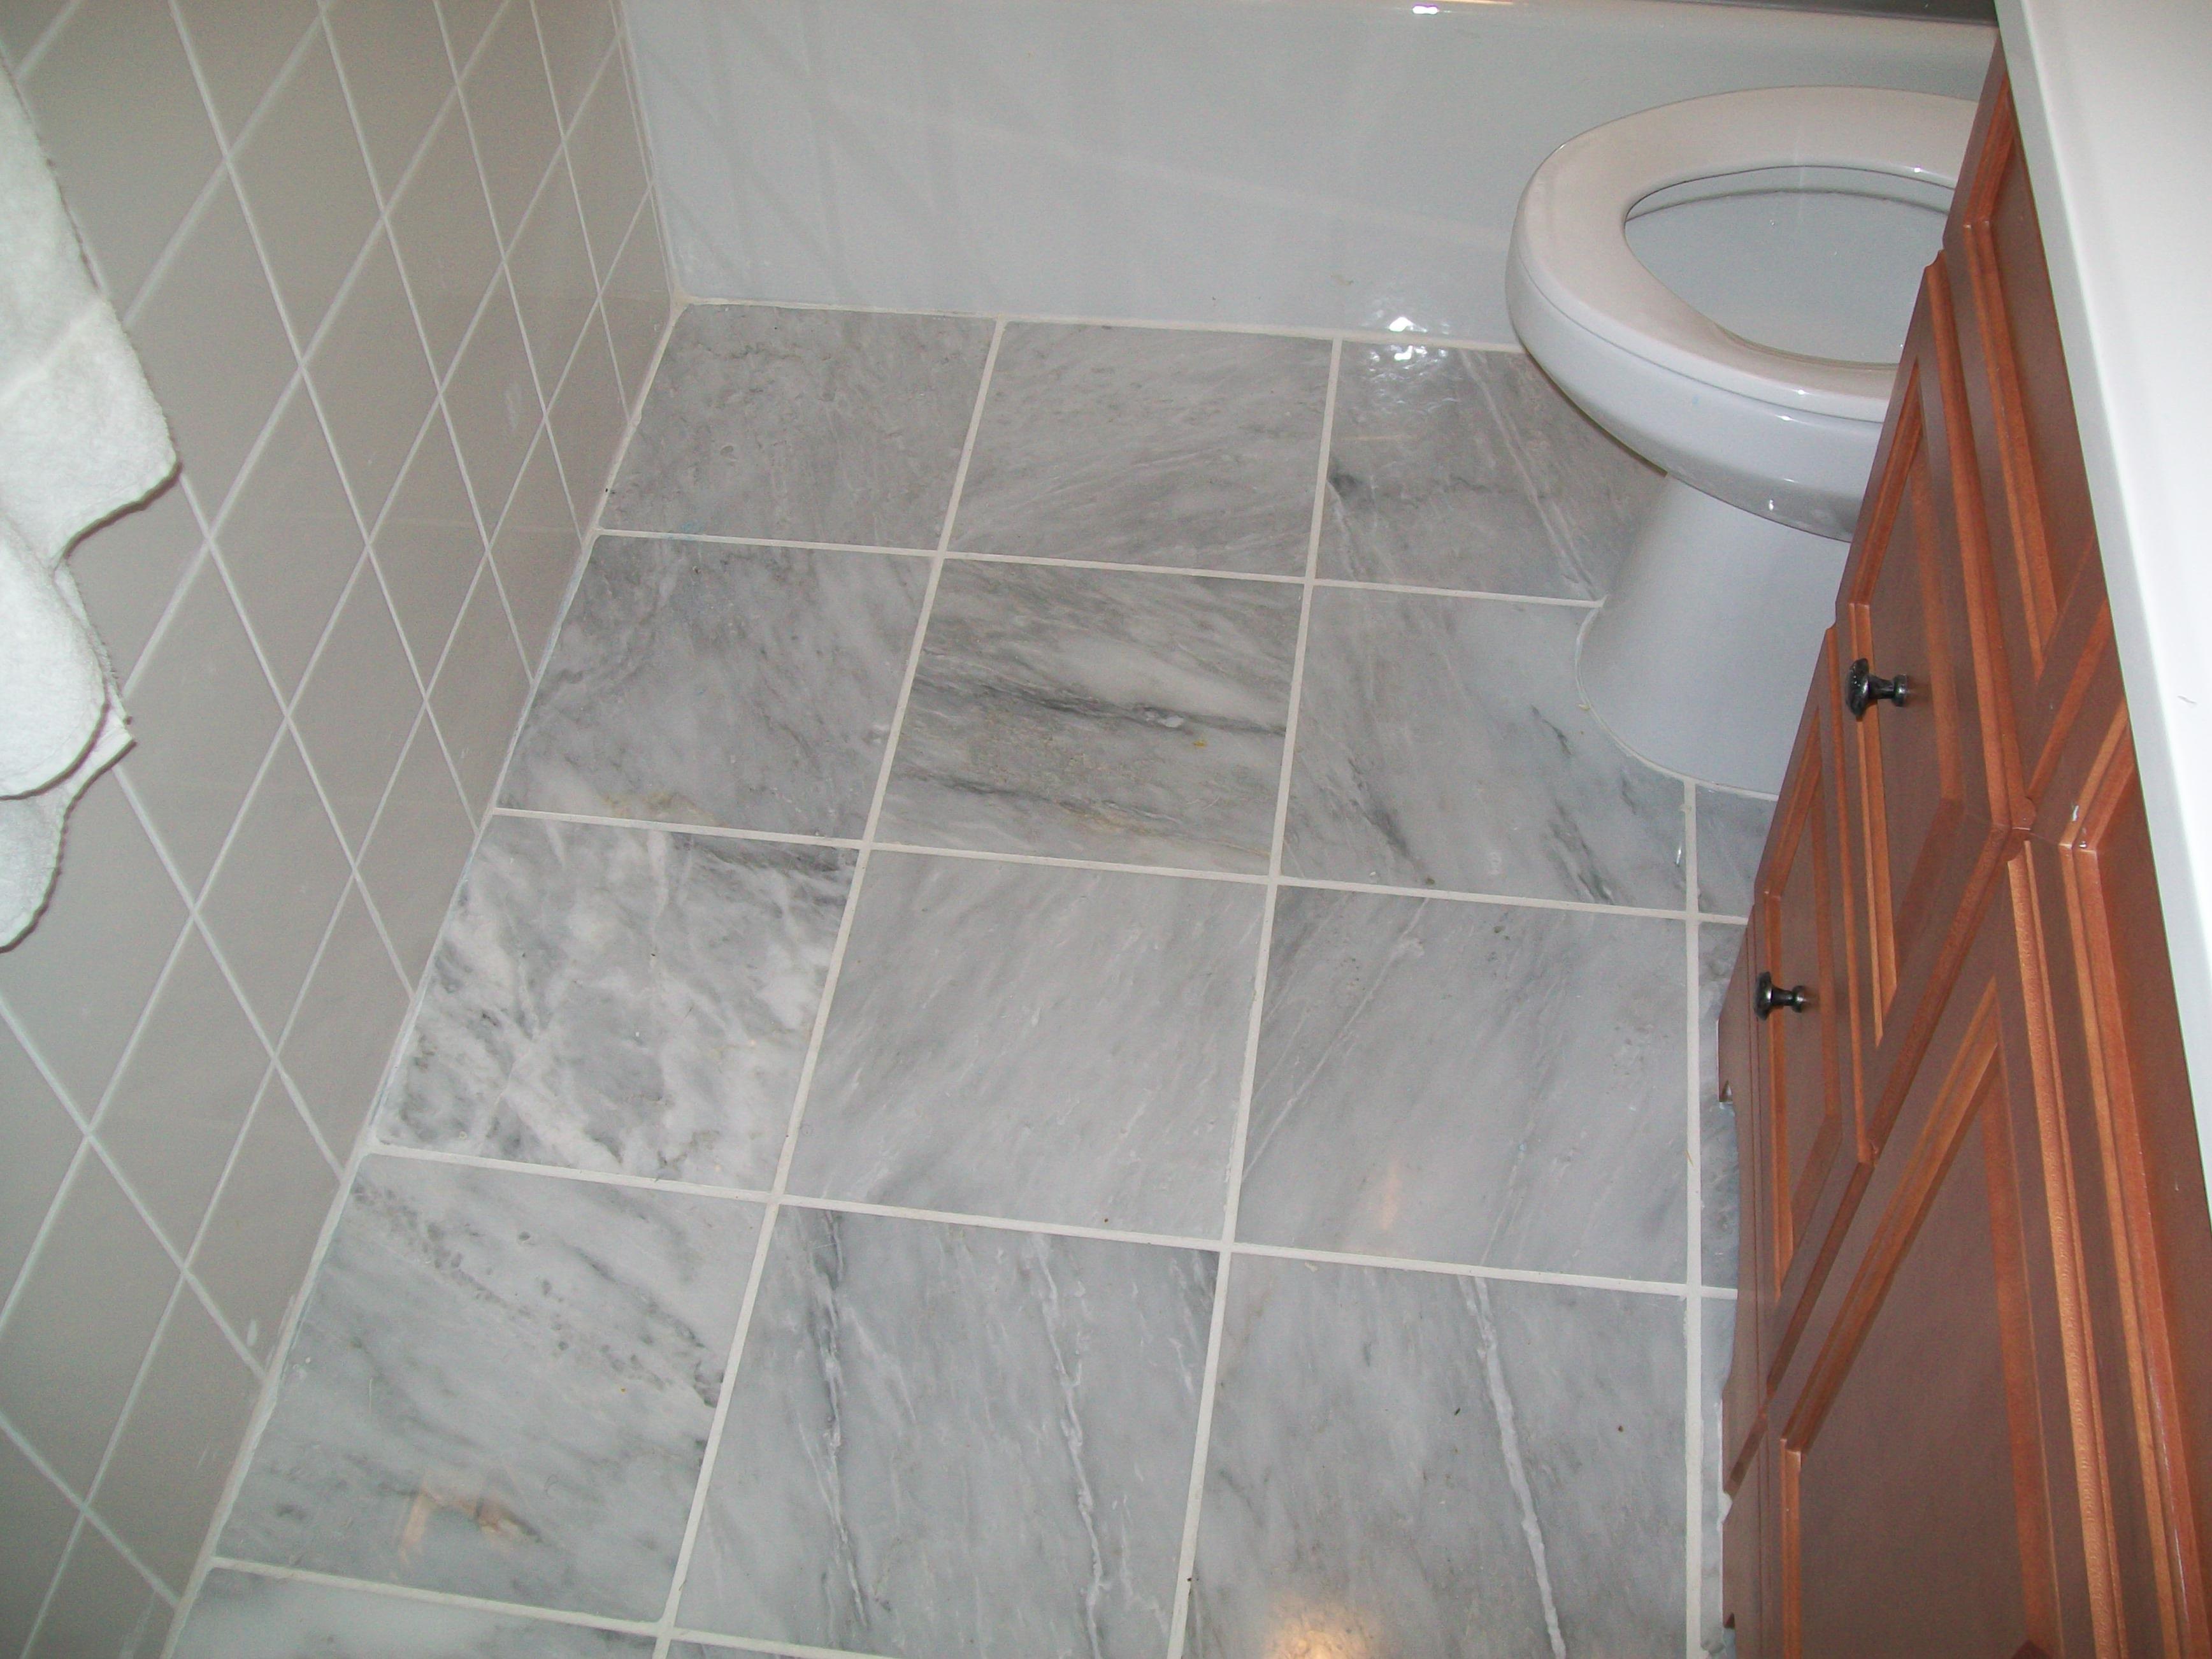 R harward construction hillsborough nc 27278 angies list for Bathrooms r us reviews